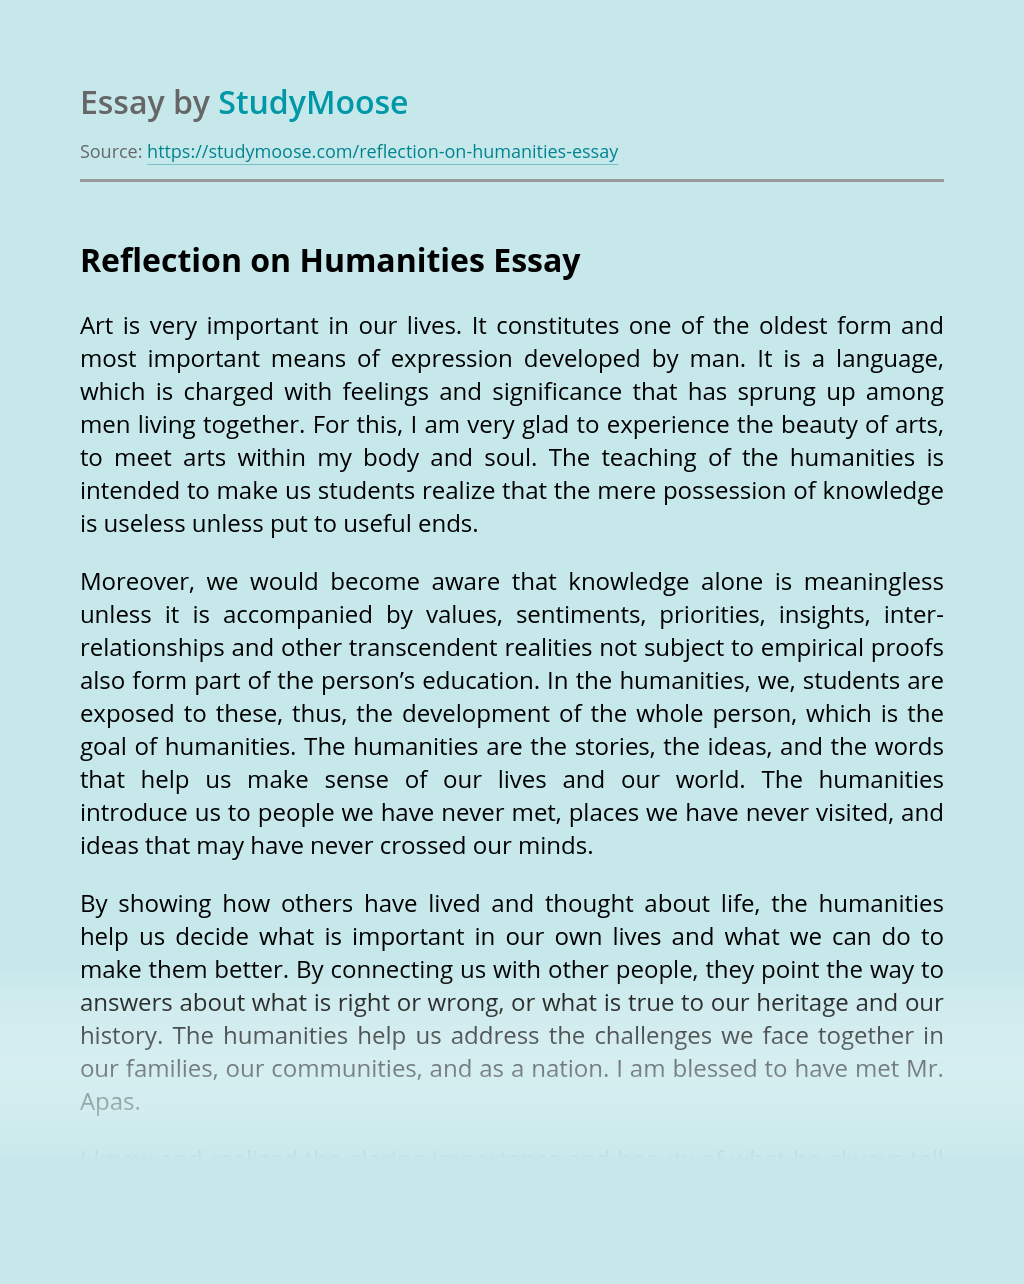 Reflection on Humanities